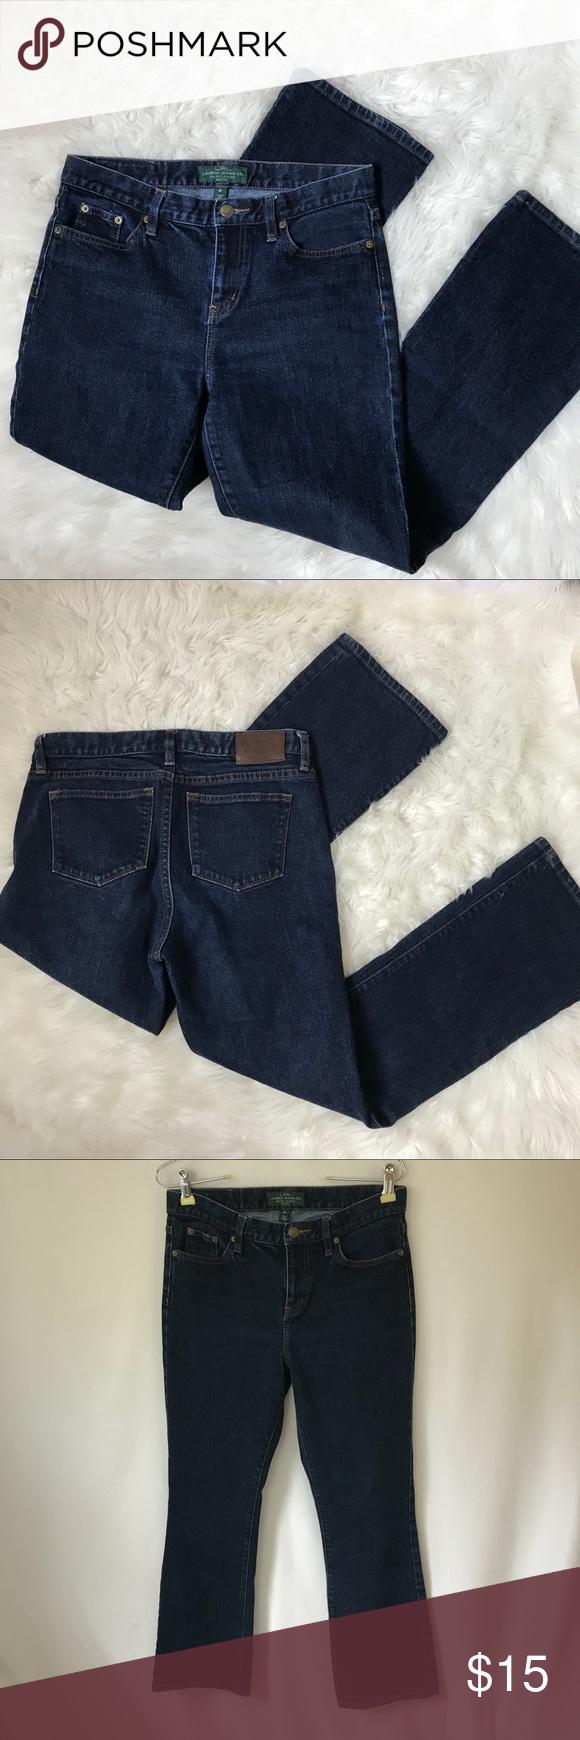 lauren-jeans-co-petite-xl-sexy-miley-cyrus-ass